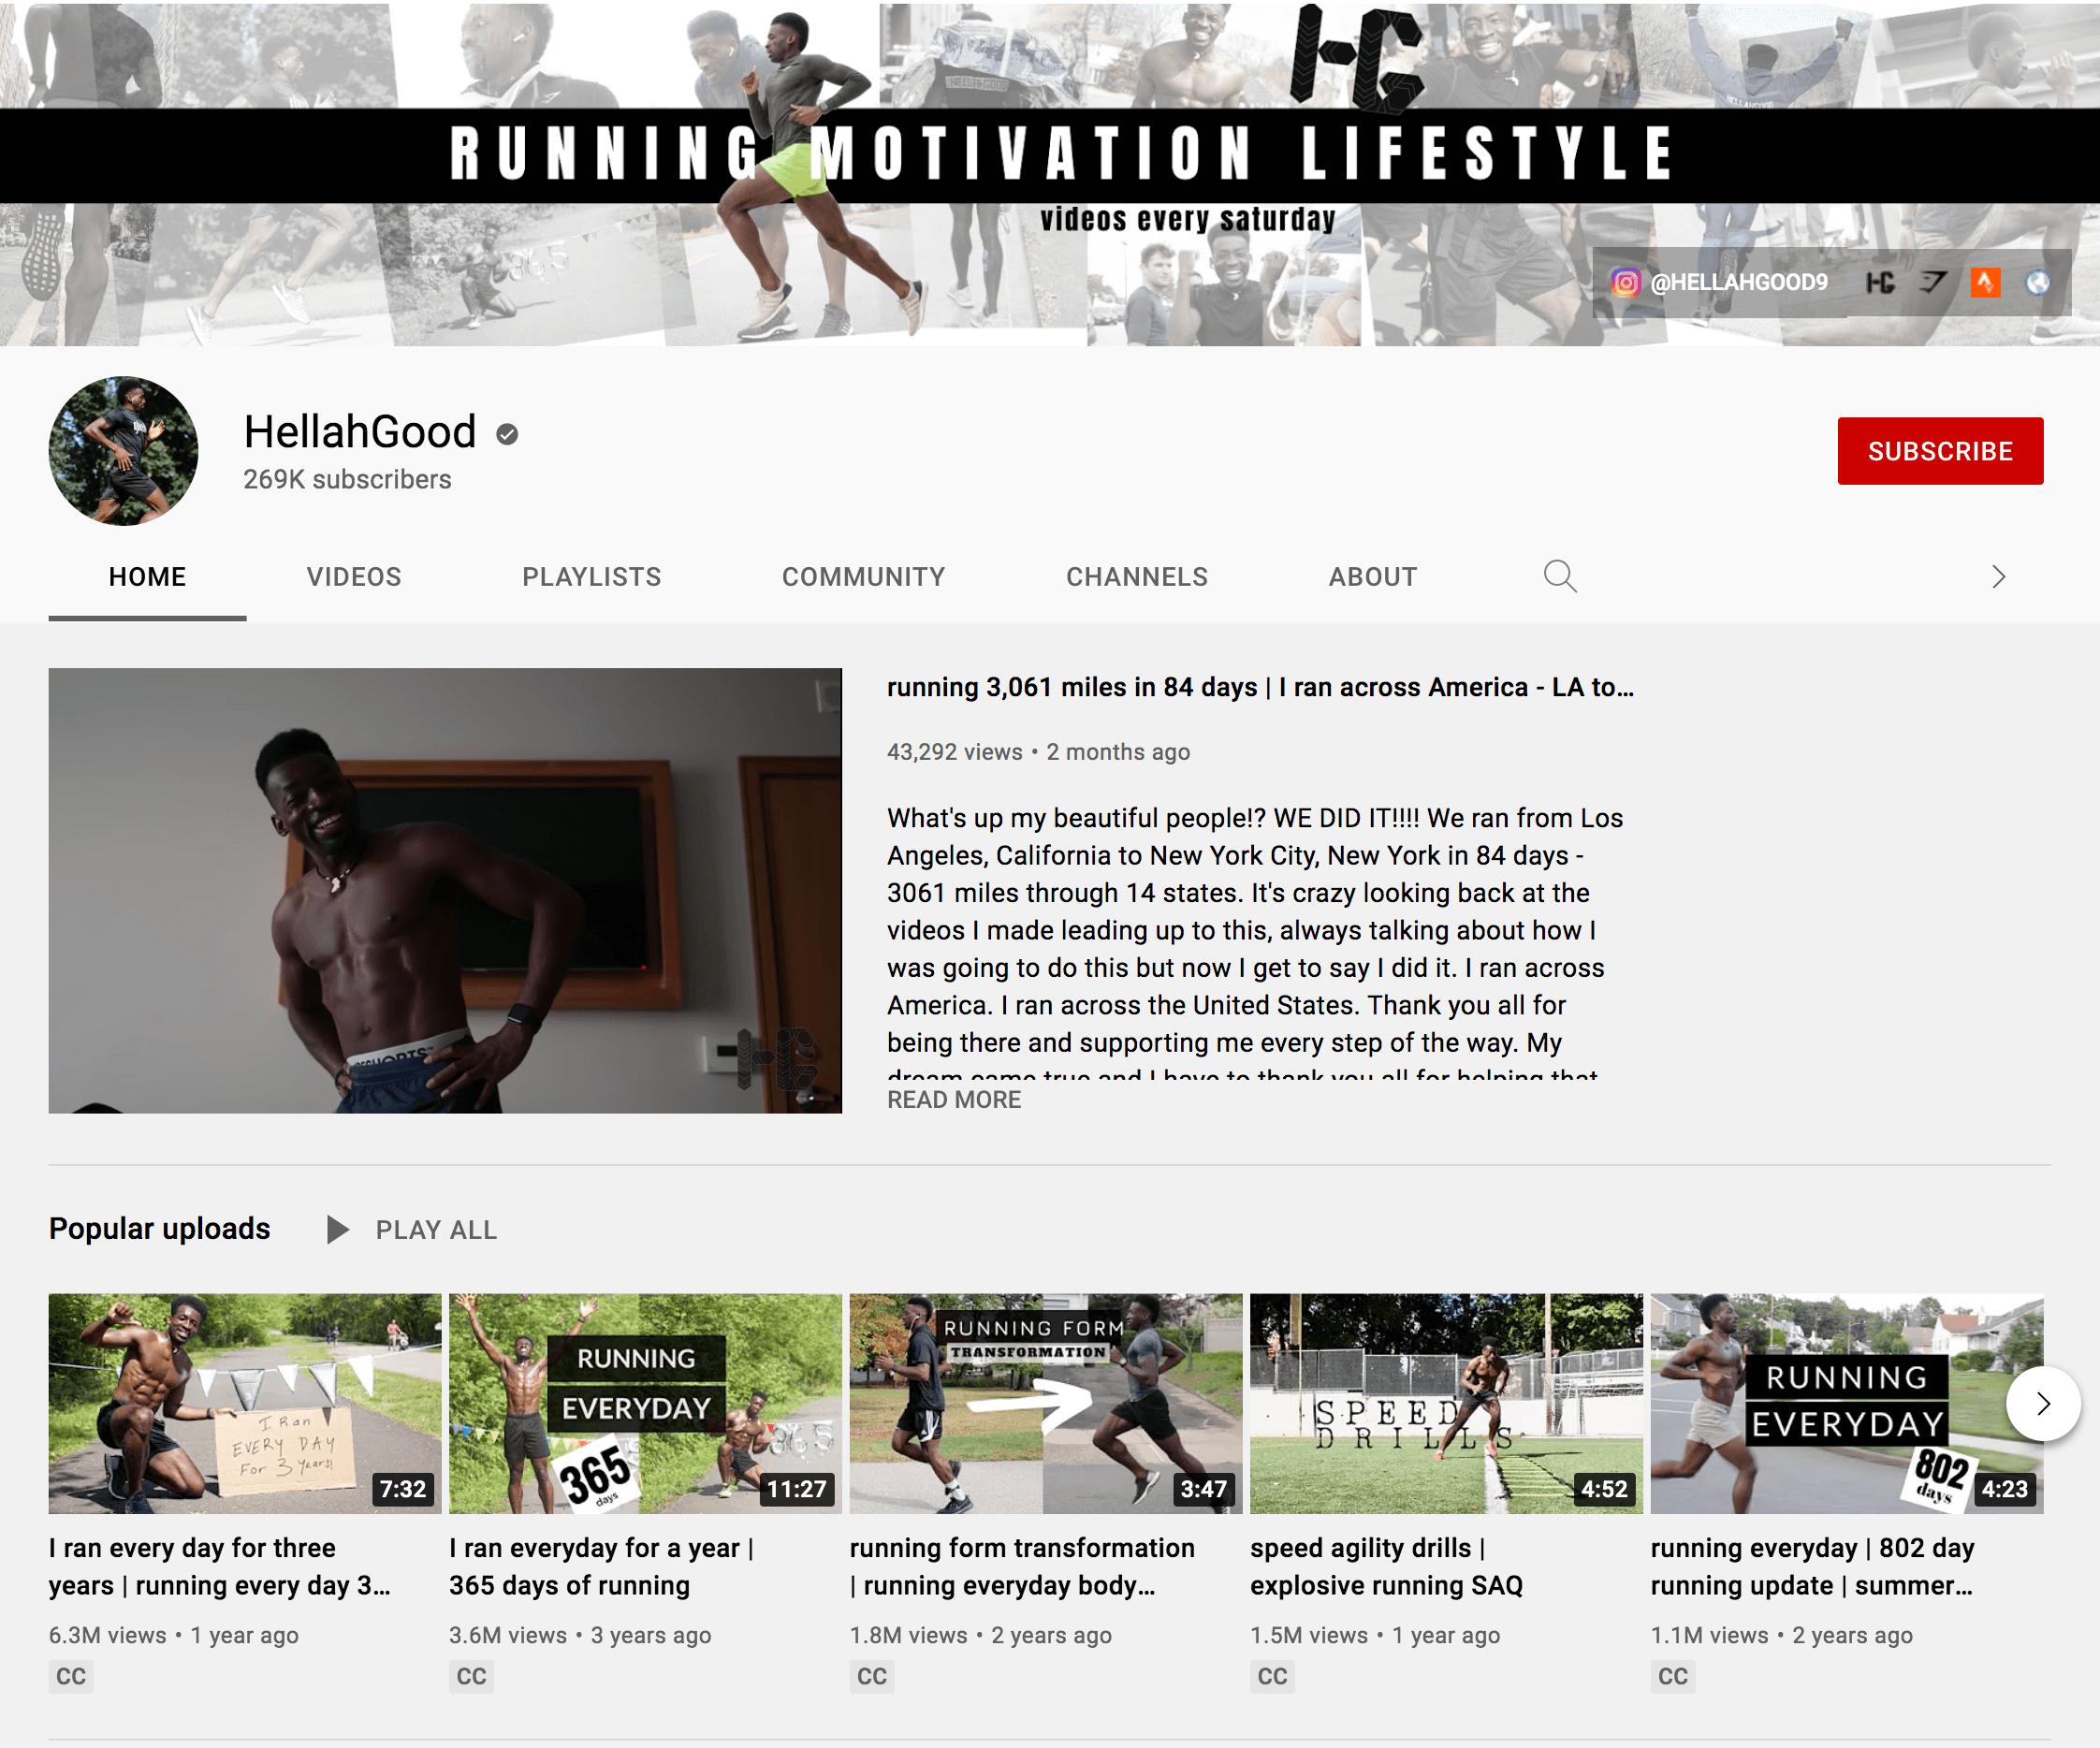 Hella Good YouTube Channel Bio